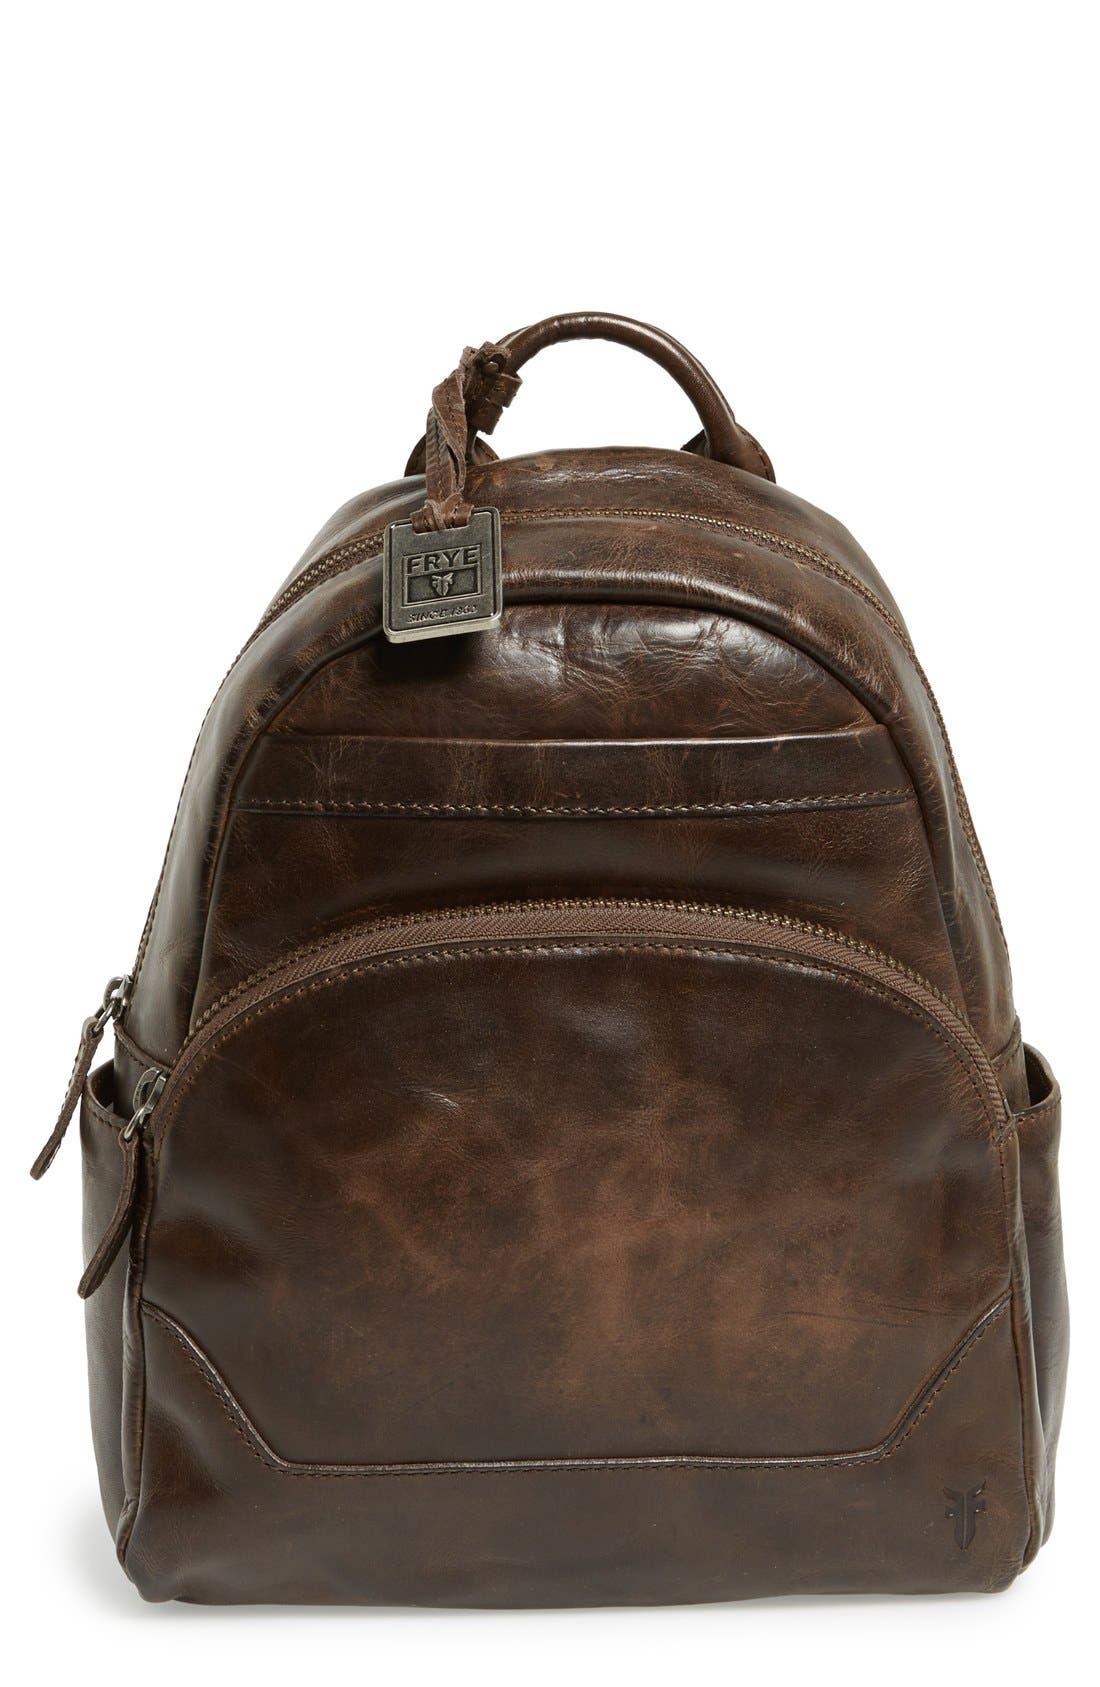 Main Image - Frye 'Melissa' Backpack